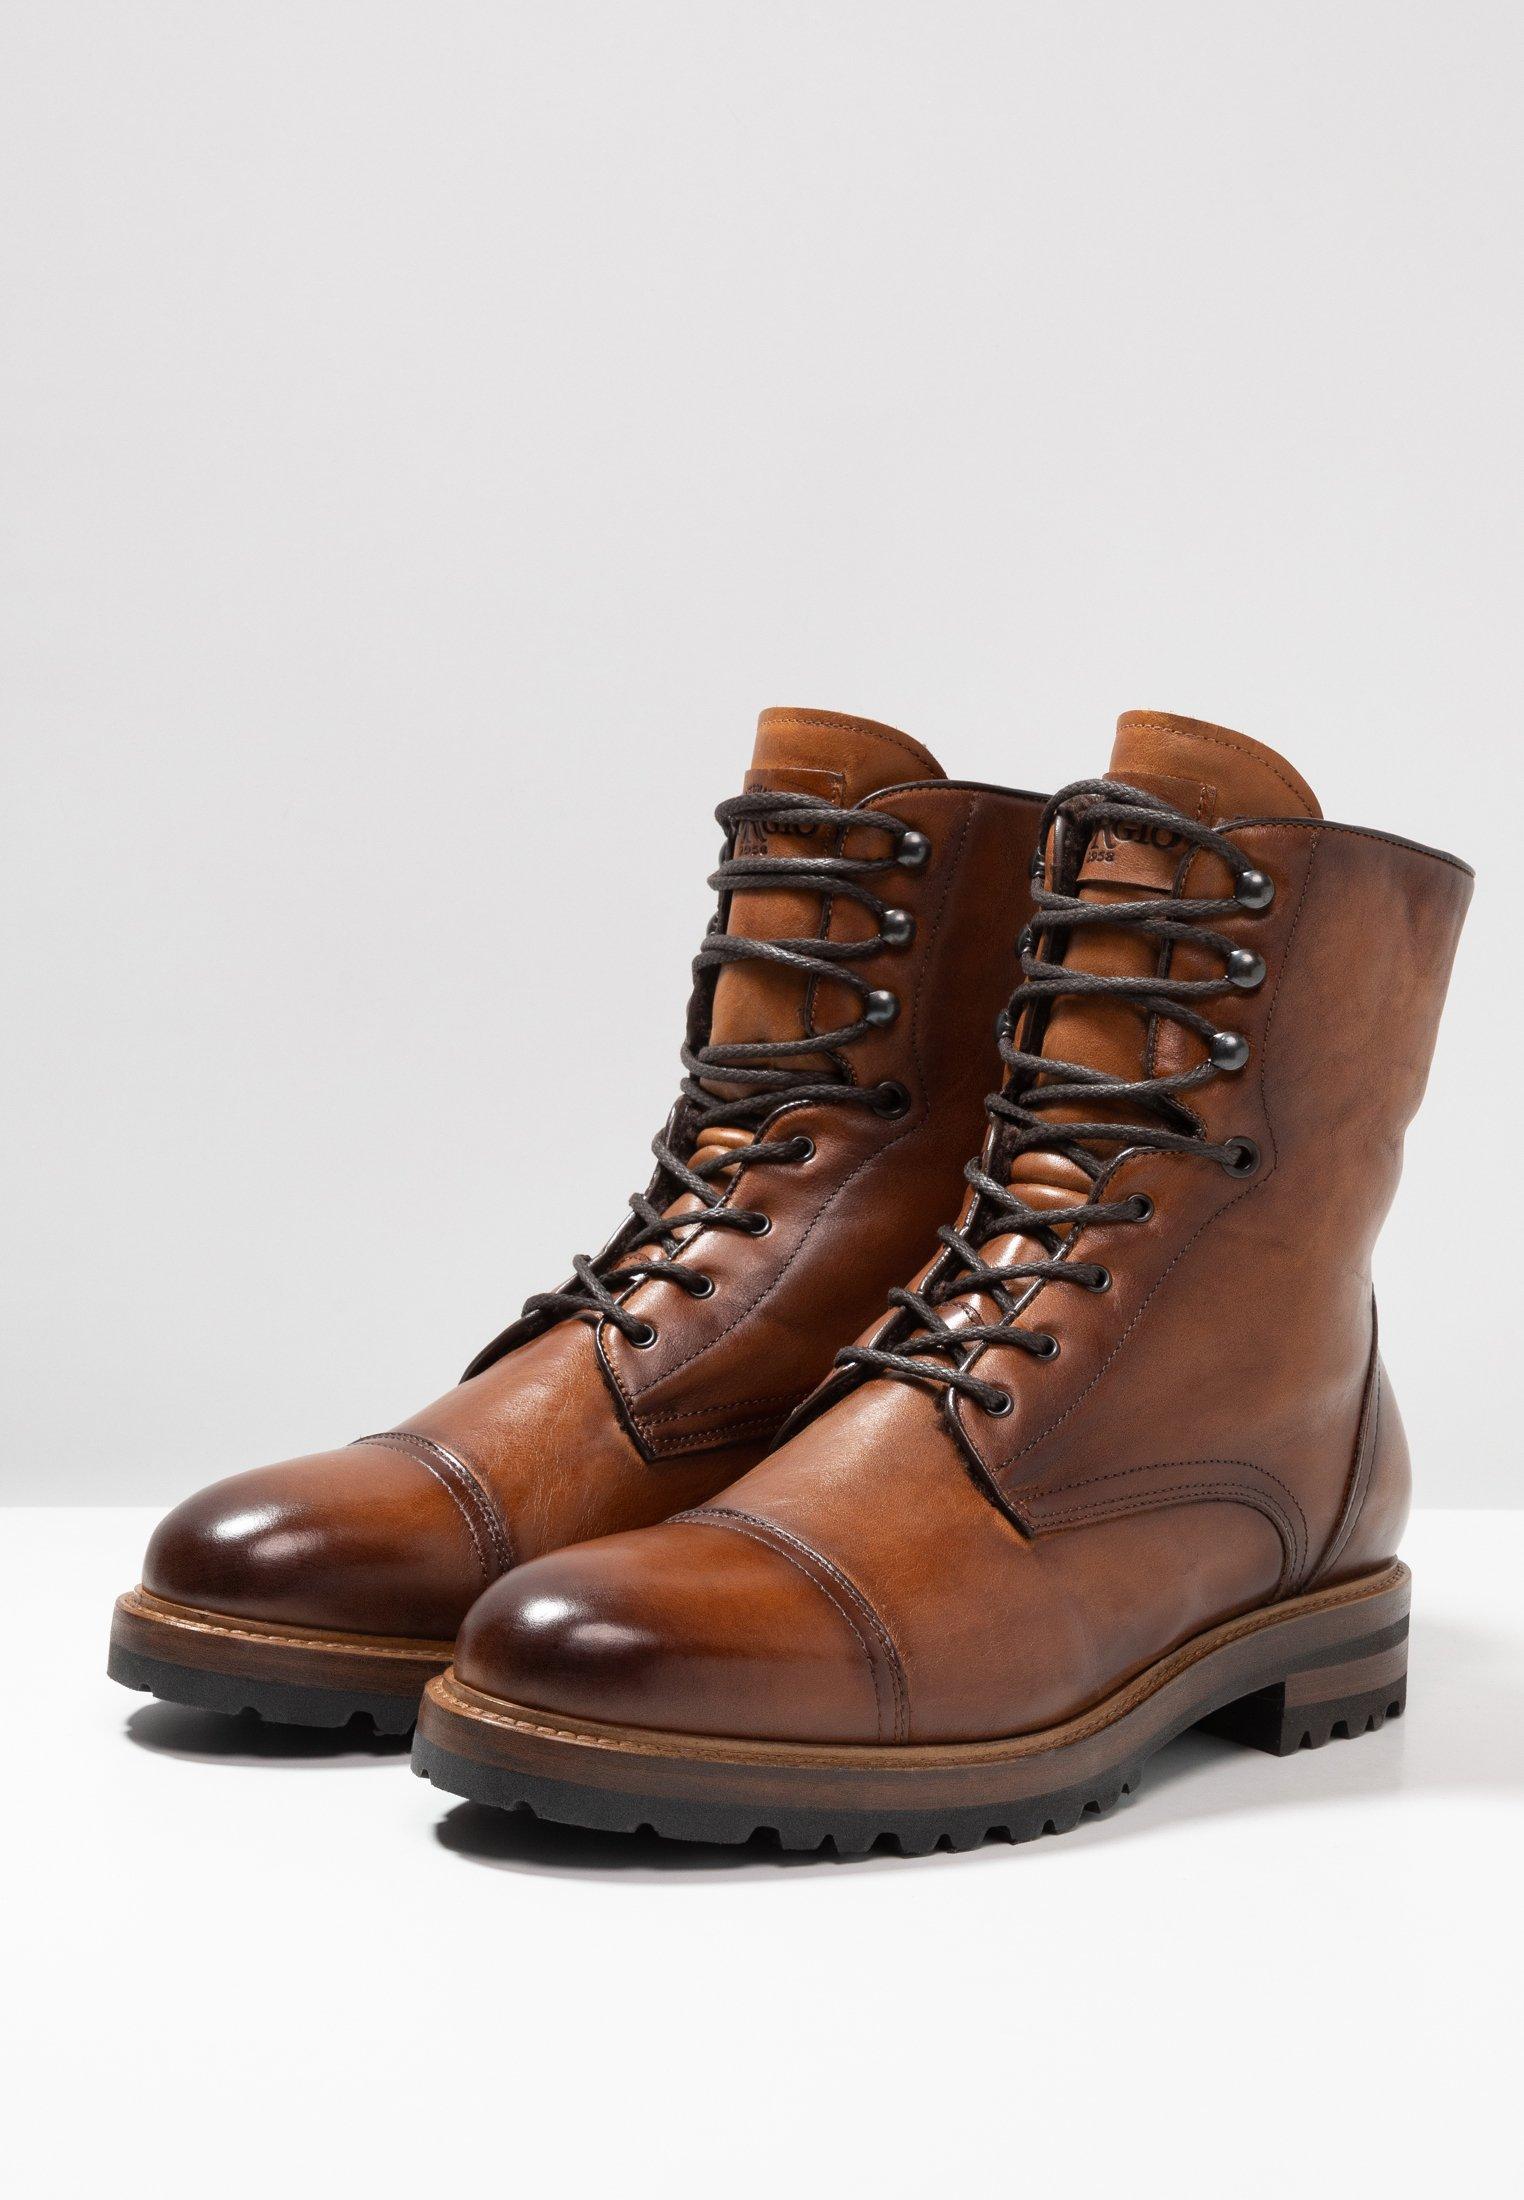 New Cheapest Giorgio 1958 Lace-up ankle boots - cognac | men's shoes 2020 H9lr6